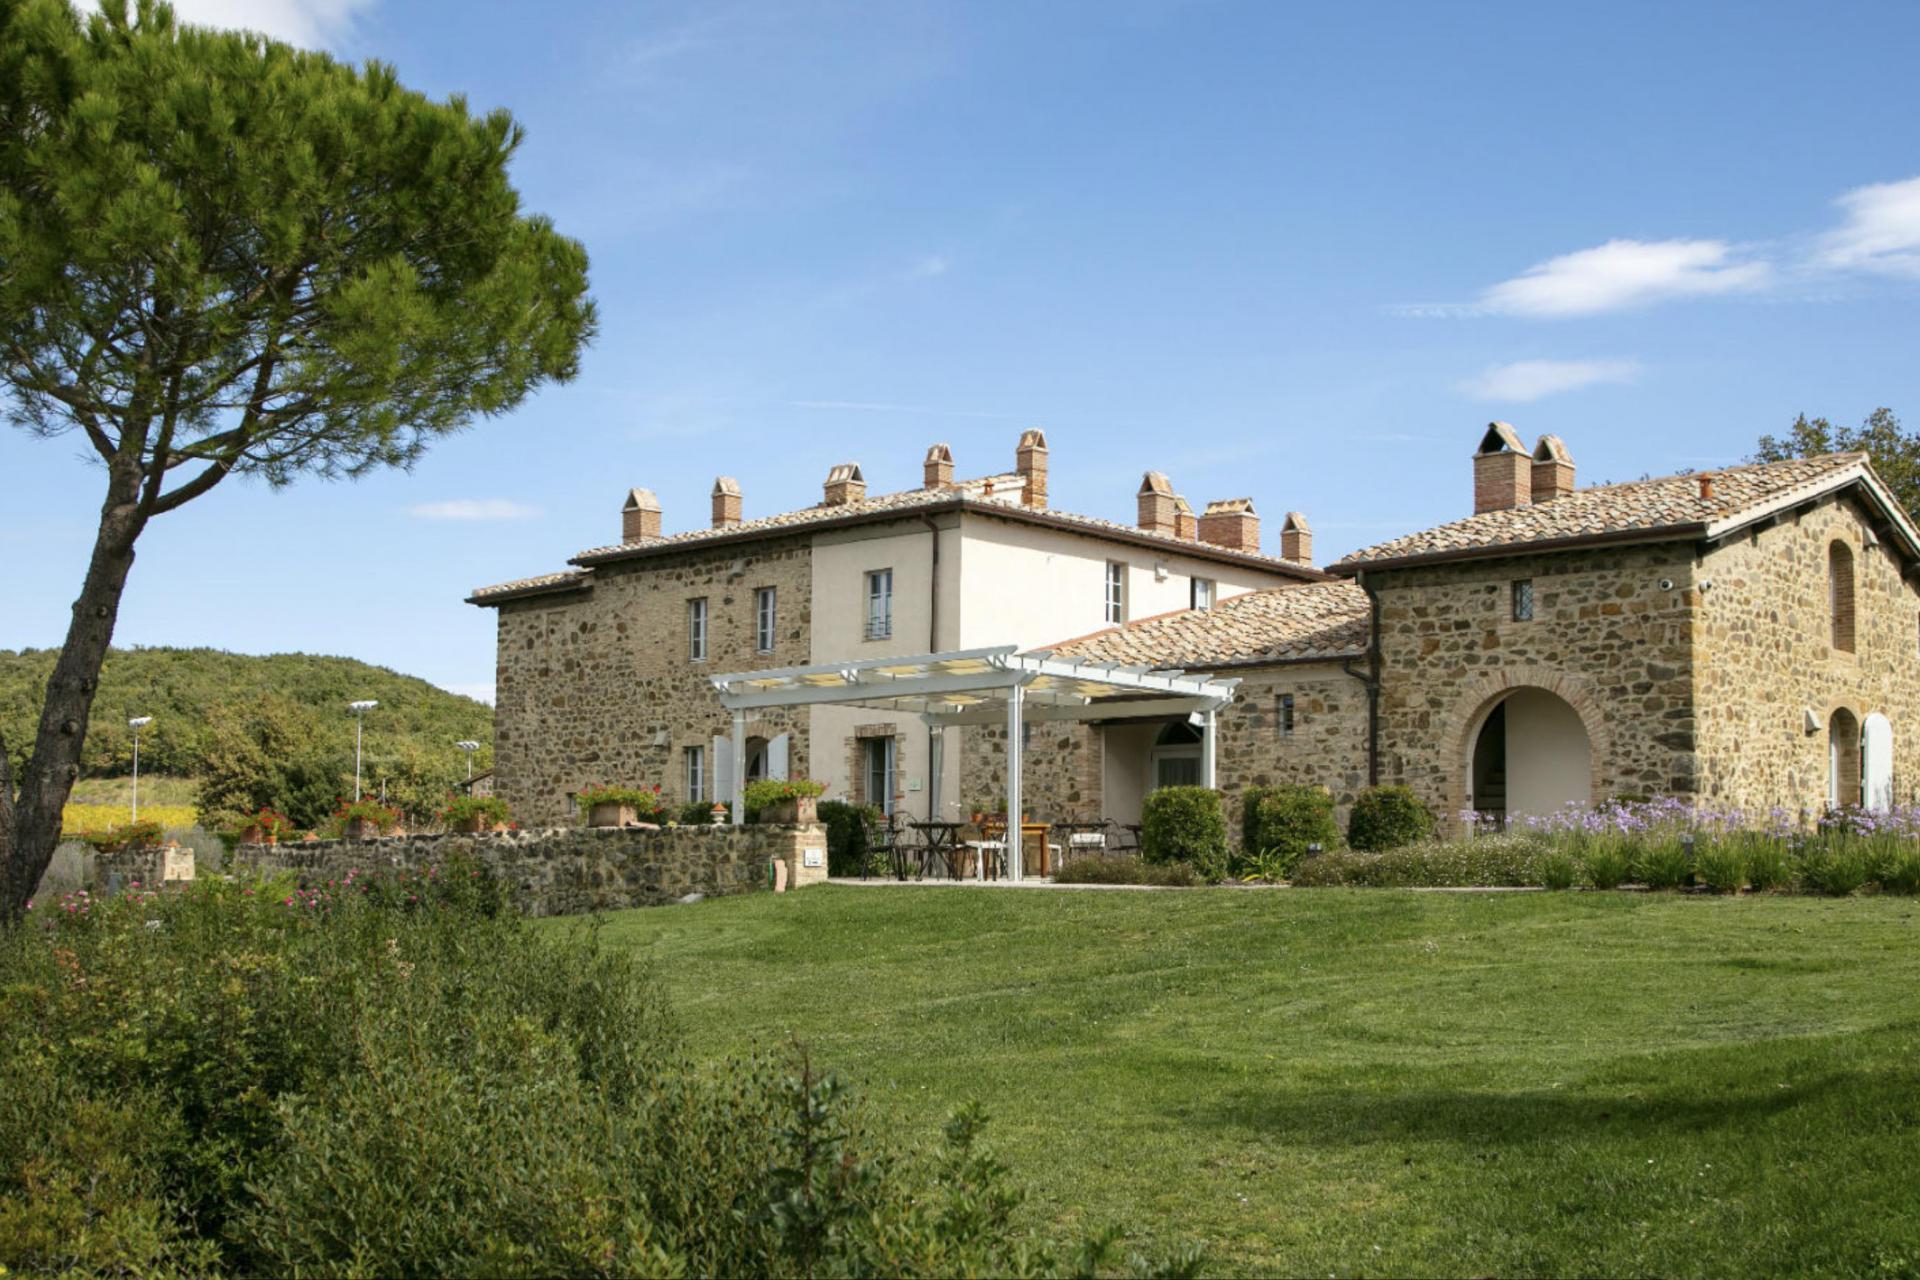 Agriturismo Toskana Urlaub in der Nähe von Montalcino | myitalyselection.de